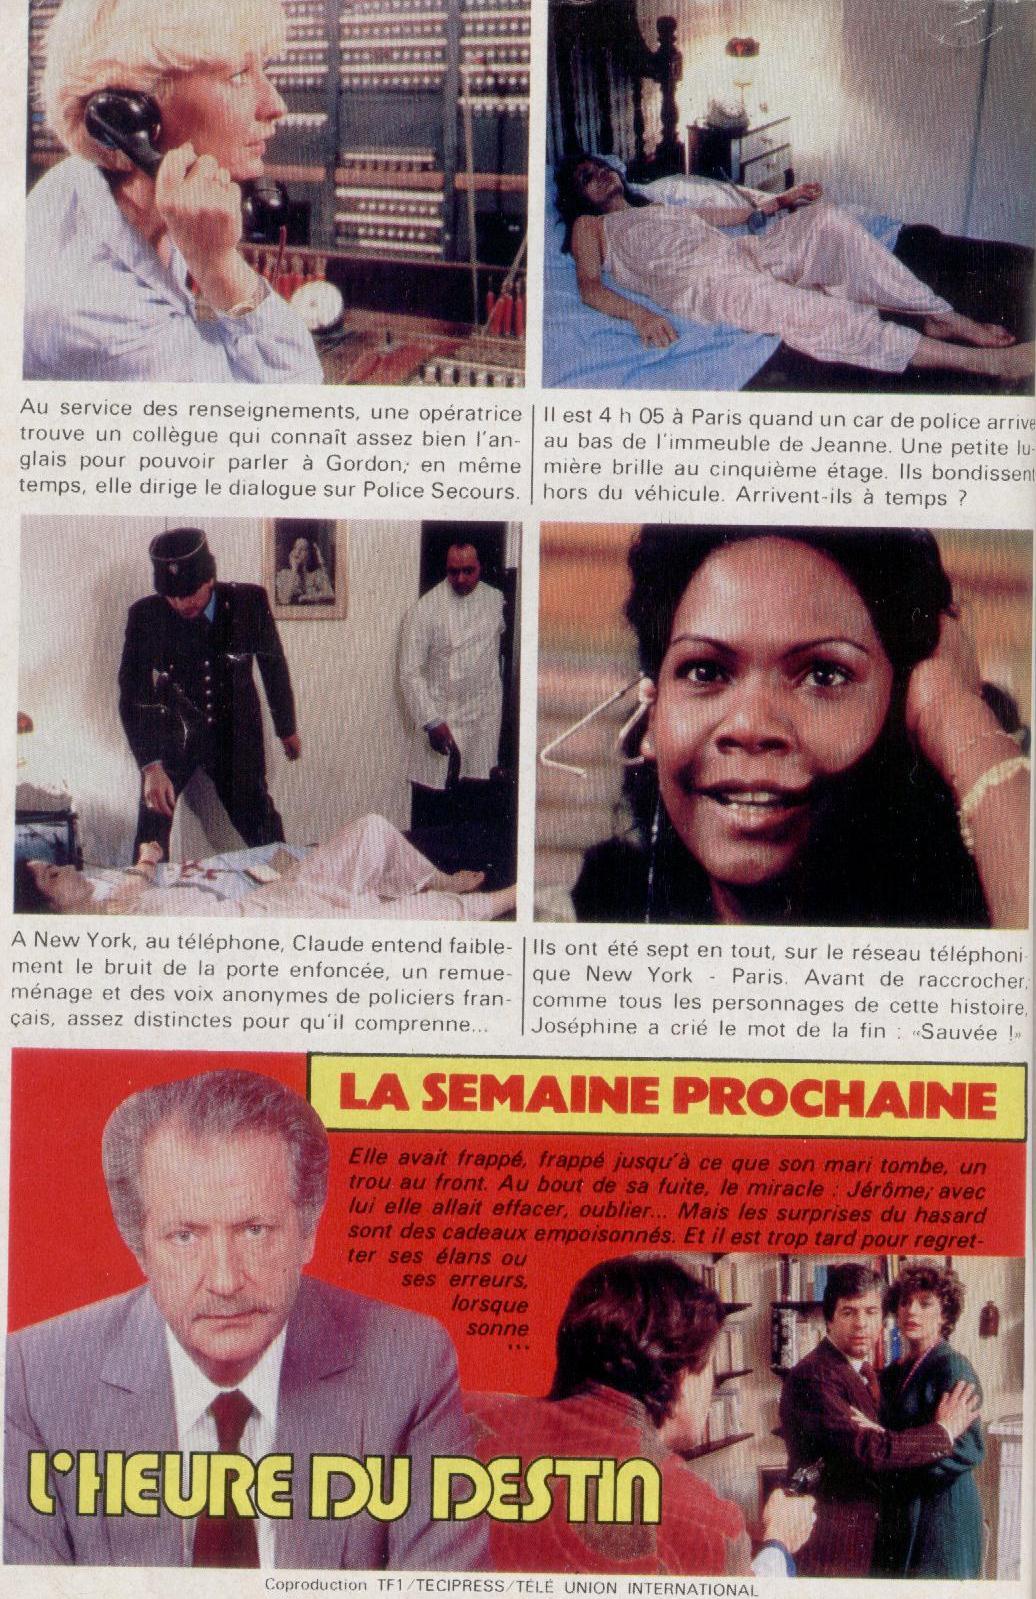 http://grenierdelatv.free.fr/bellemareracontetpjuillet198107.jpg